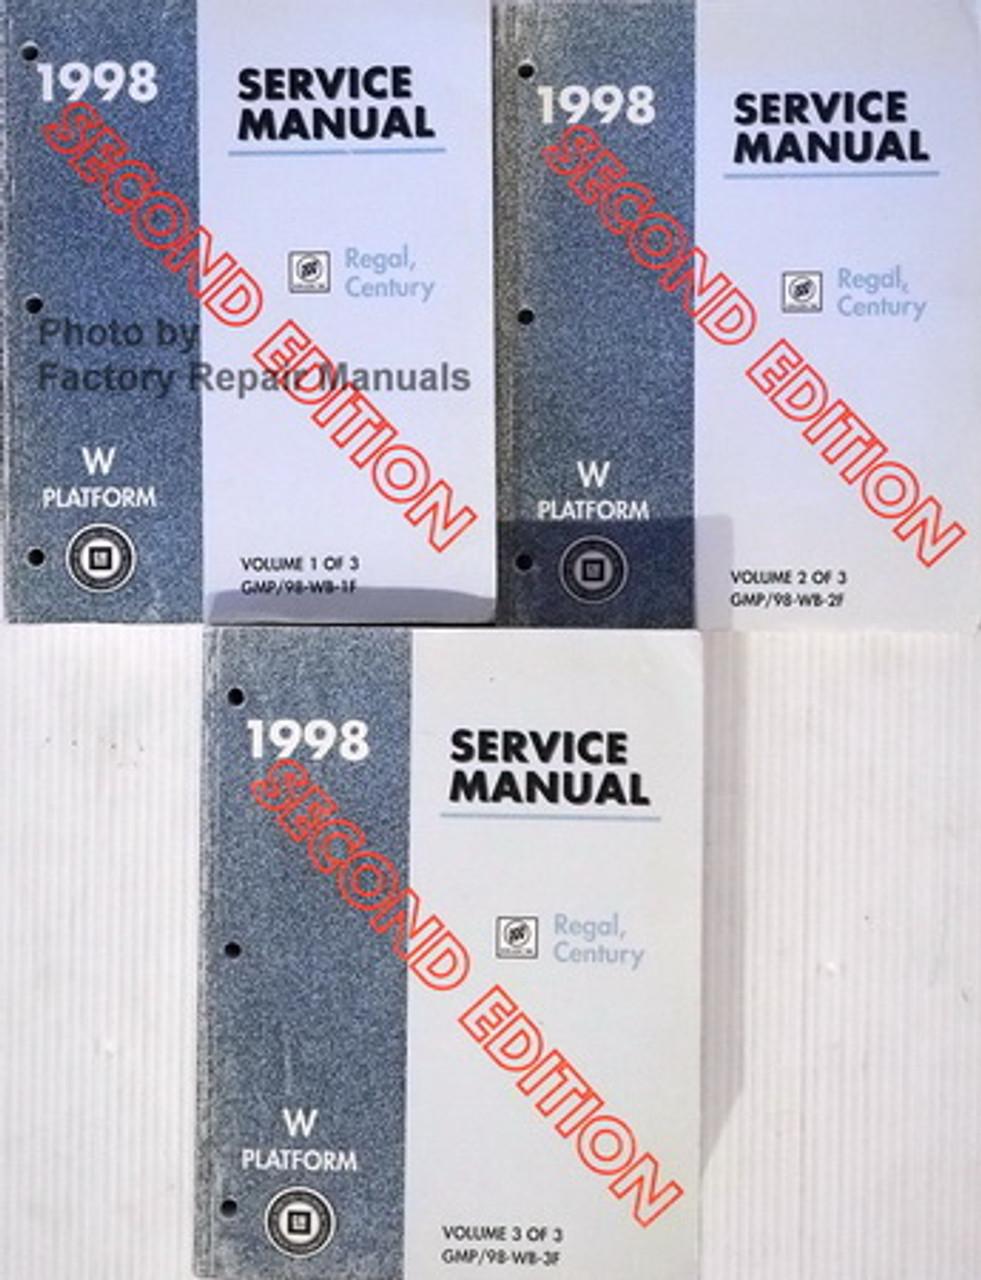 1998 Buick Century Regal Factory Service Manual Set Original Shop Repair